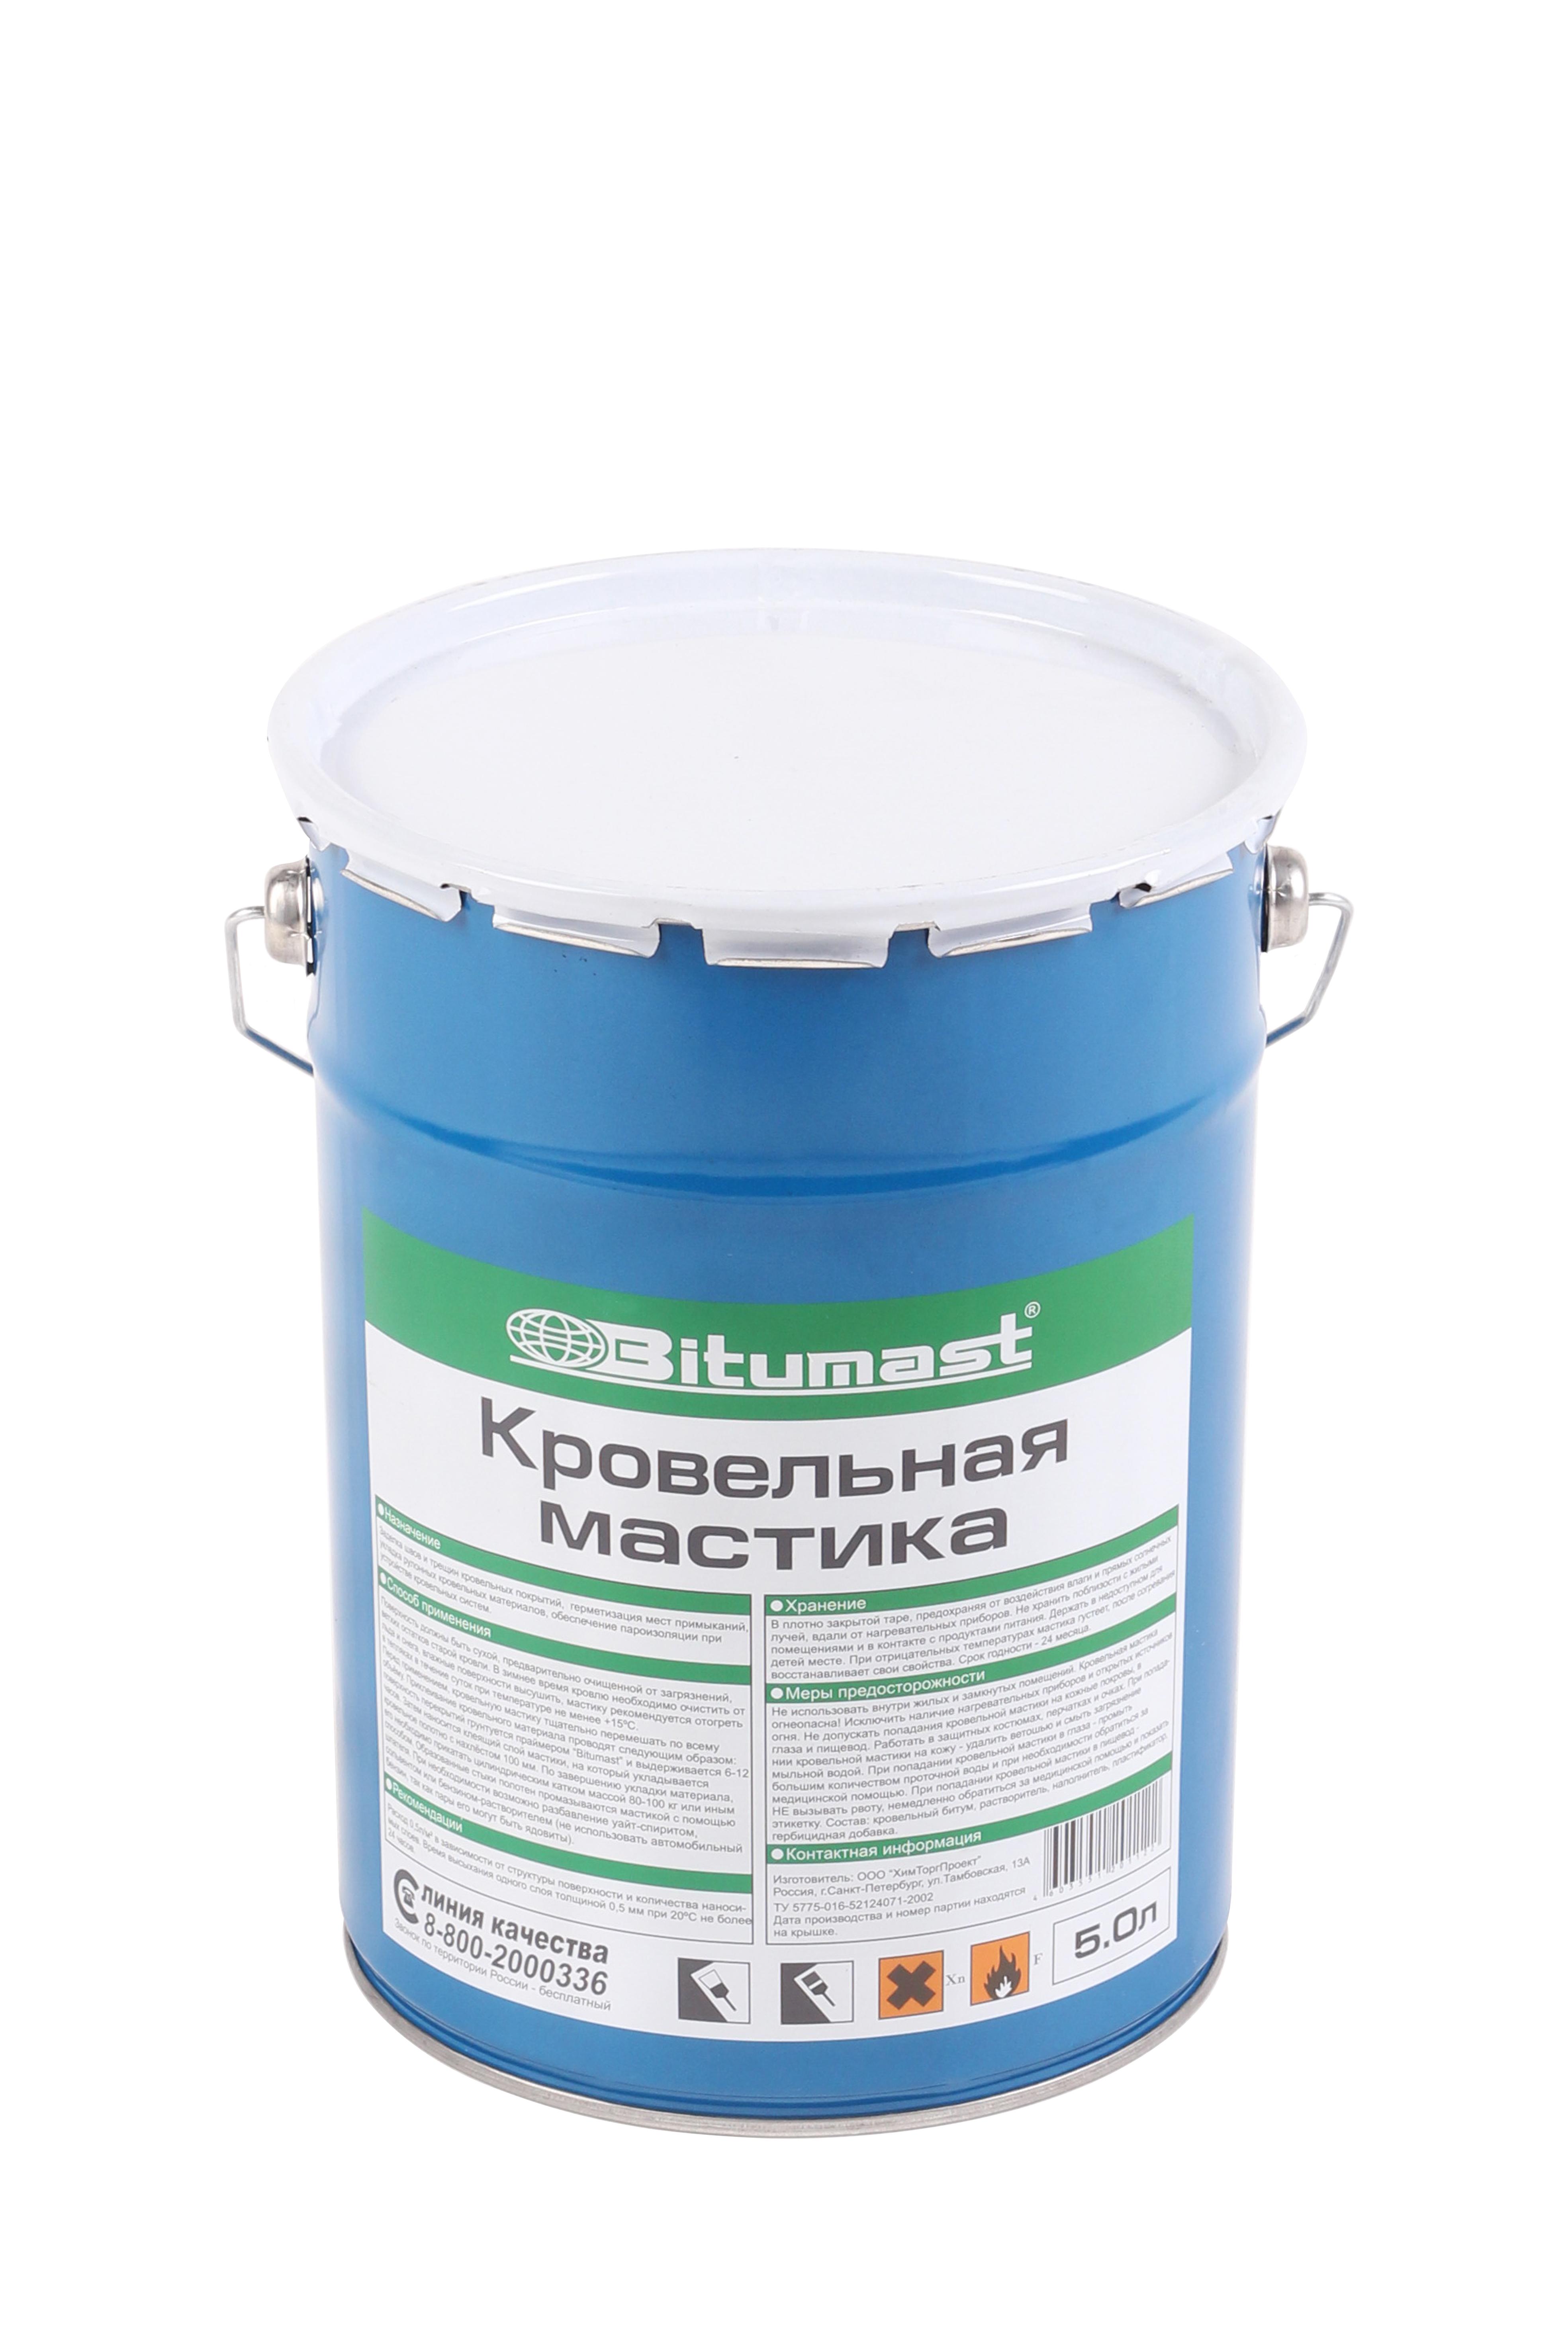 Мастика кровельная Bitumast 4,5 кг/ 5 л